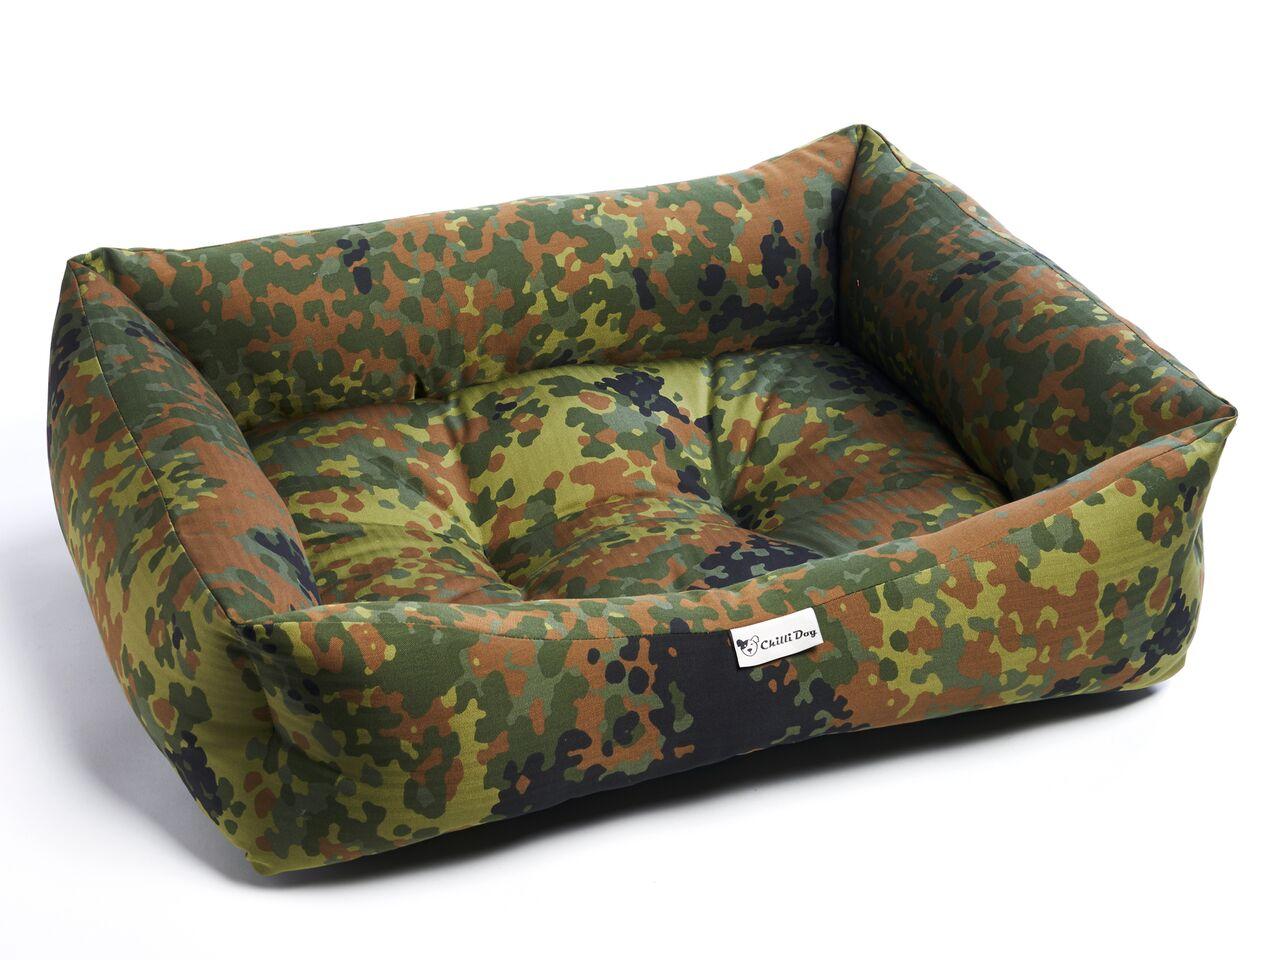 Excellent Forest Camouflage Luxury Dog Sofa Bed Interior Design Ideas Helimdqseriescom